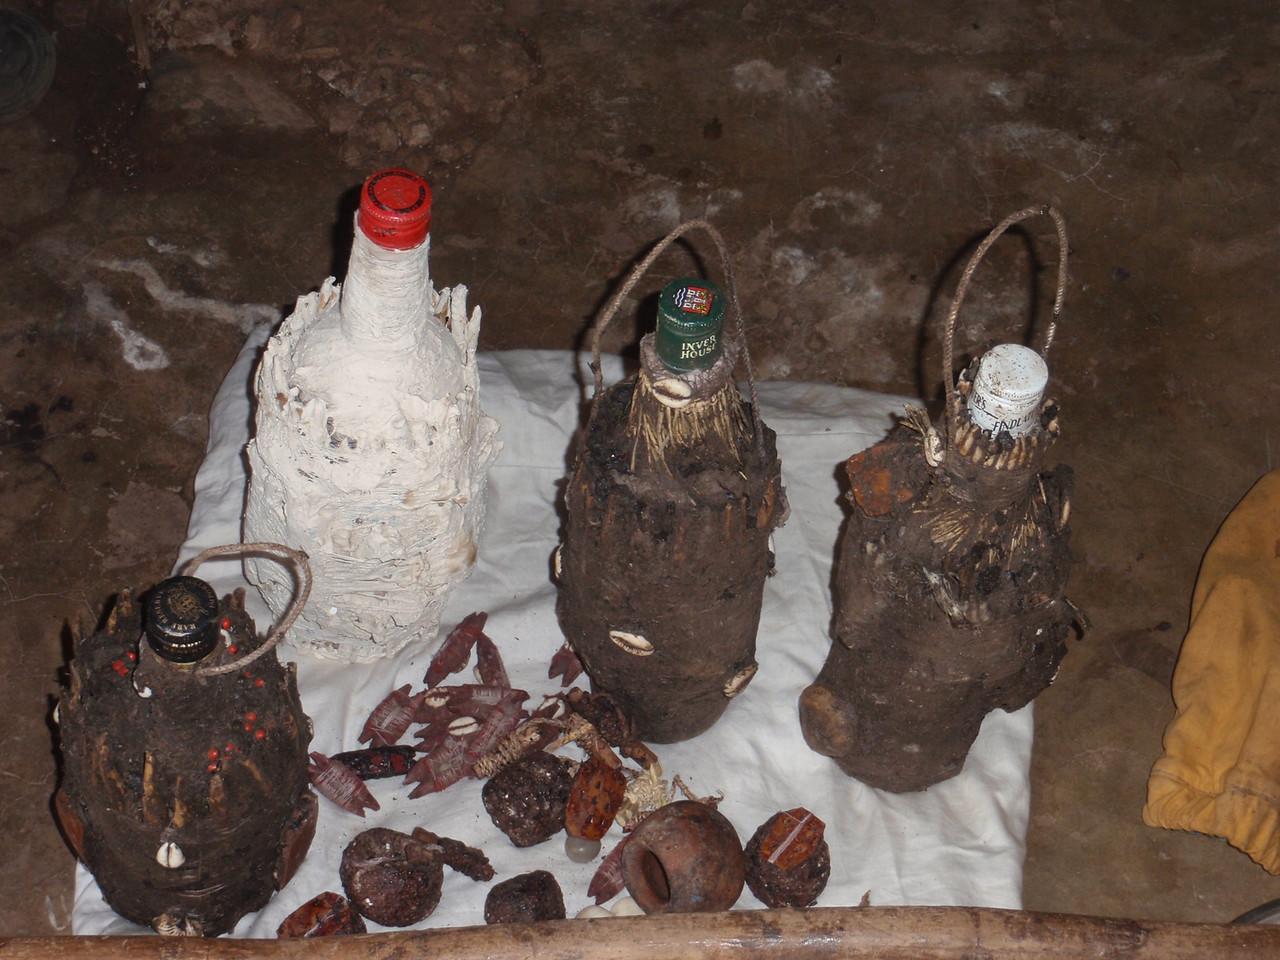 136_Abomey-Calavi Fetish Market  Raw Materials for Intervention